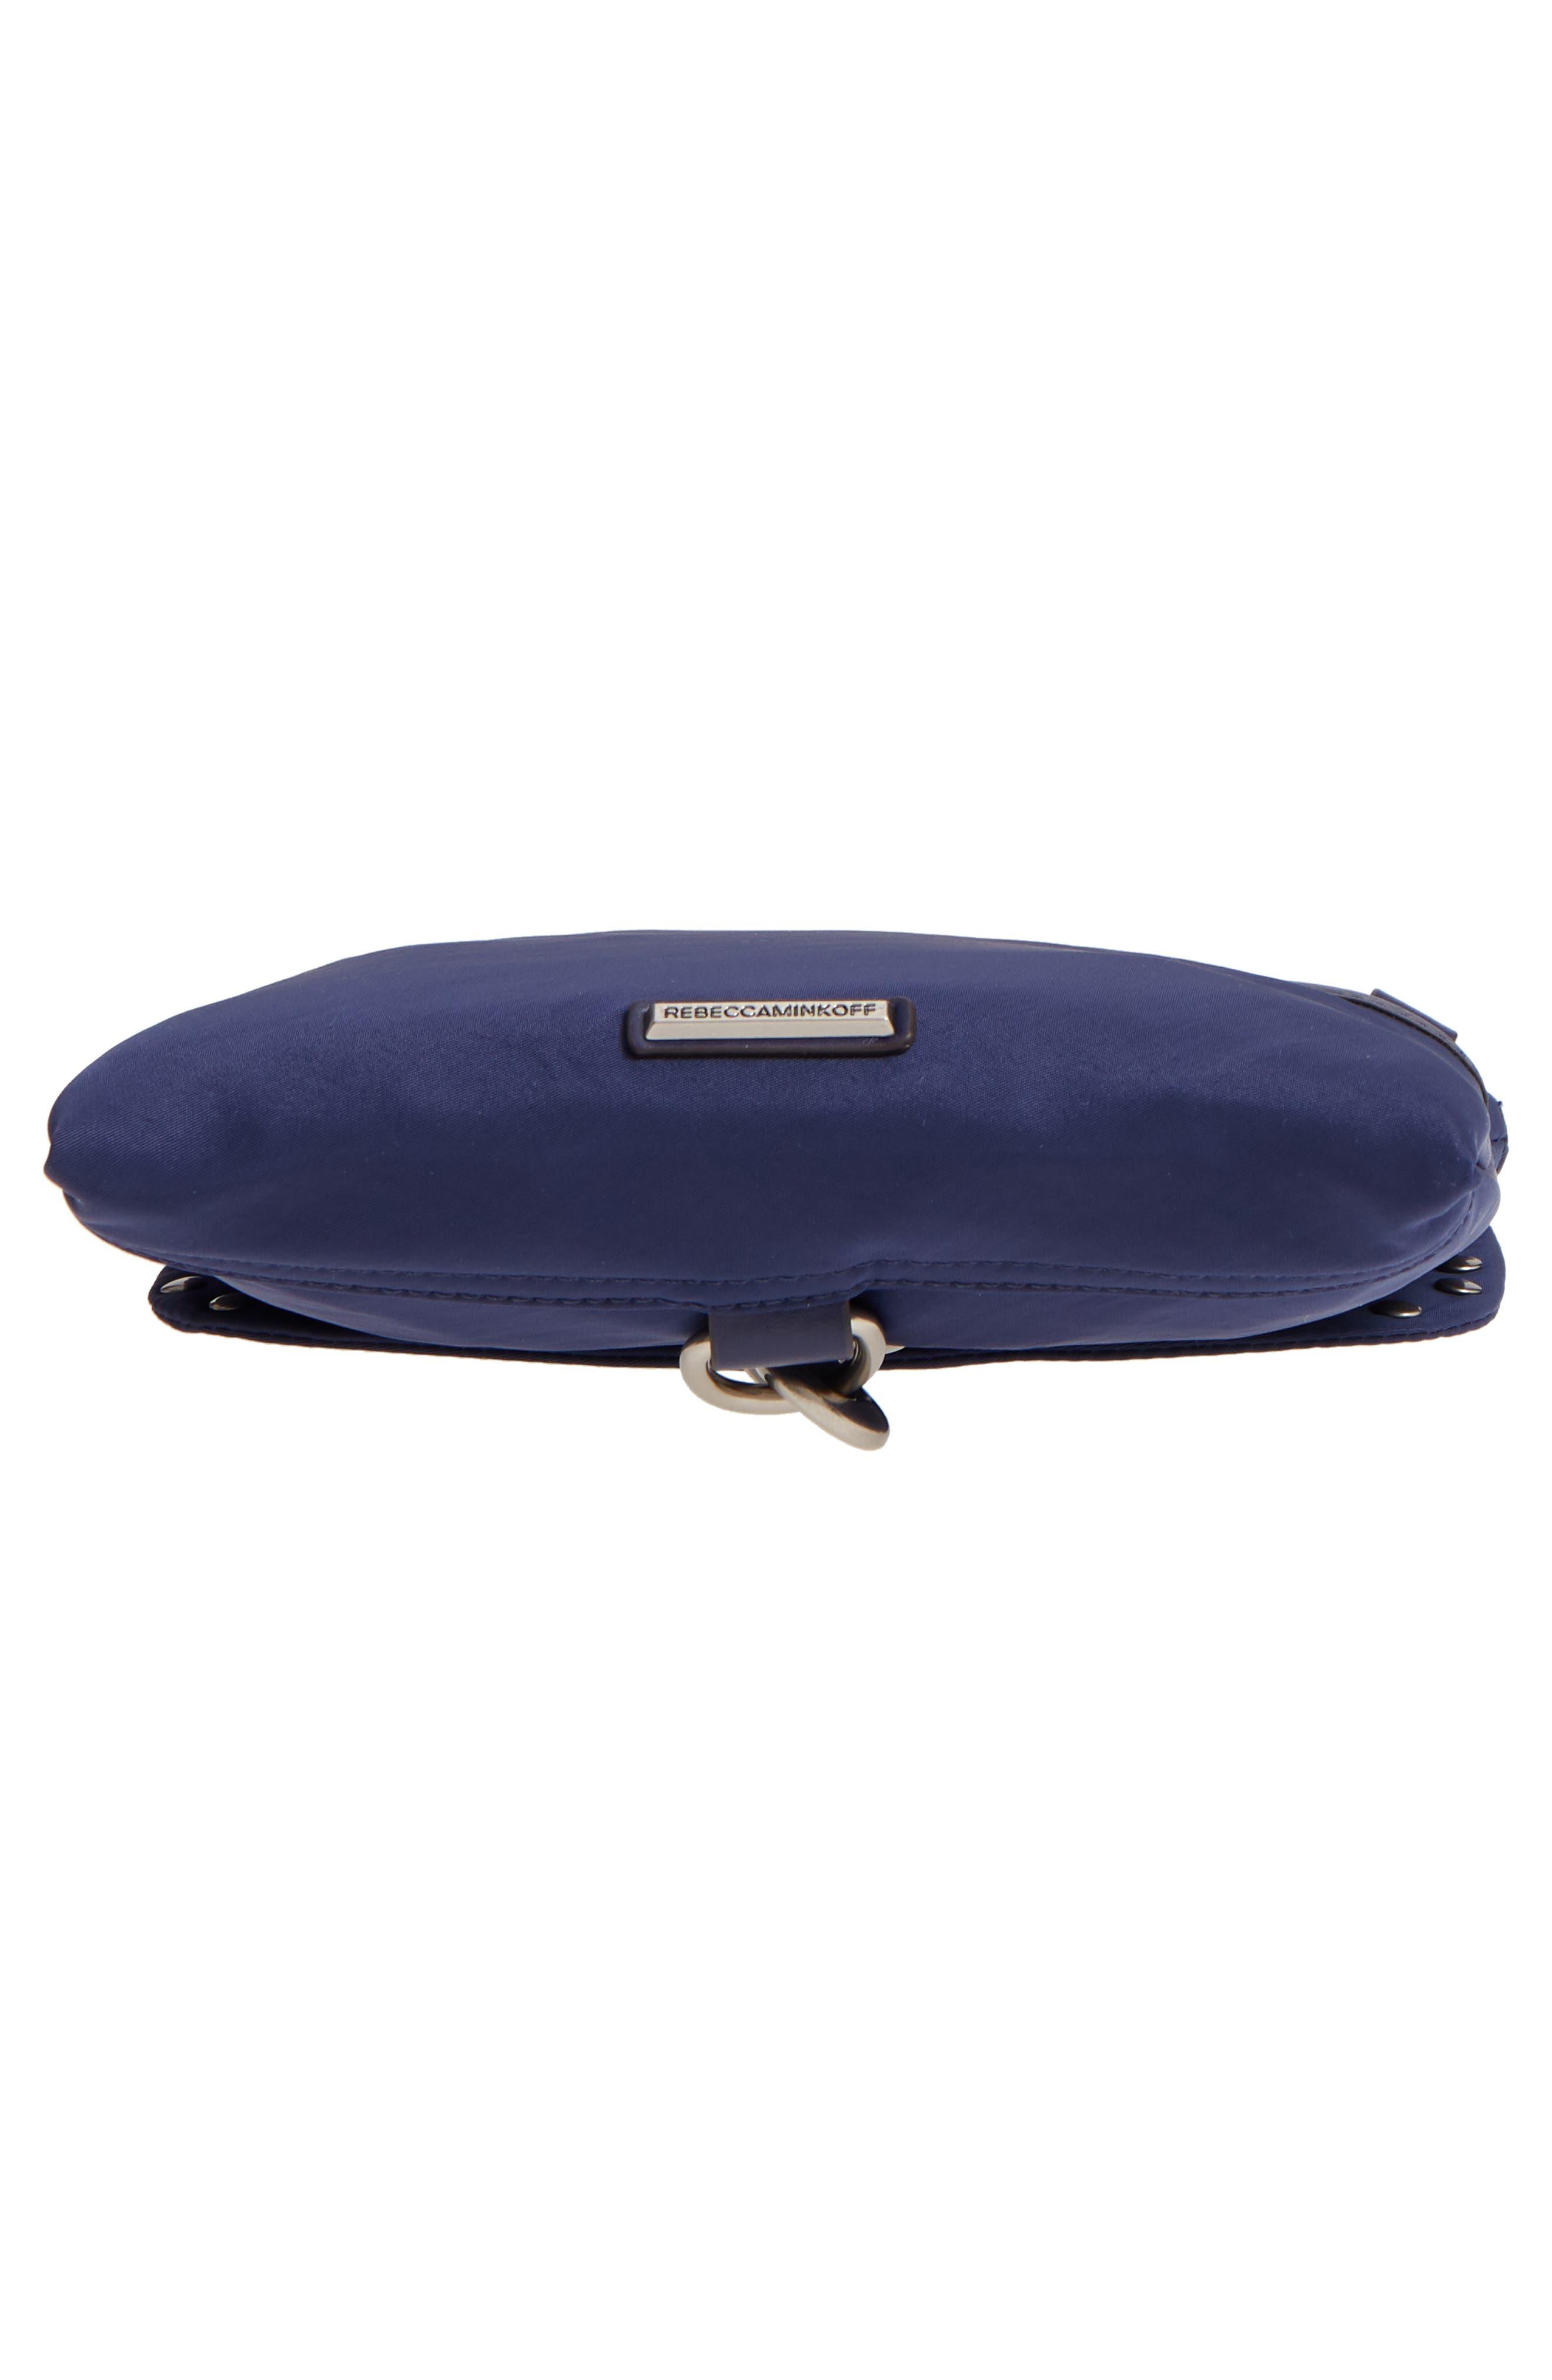 Nylon Flap Crossbody Bag,                             Alternate thumbnail 6, color,                             TRUE NAVY